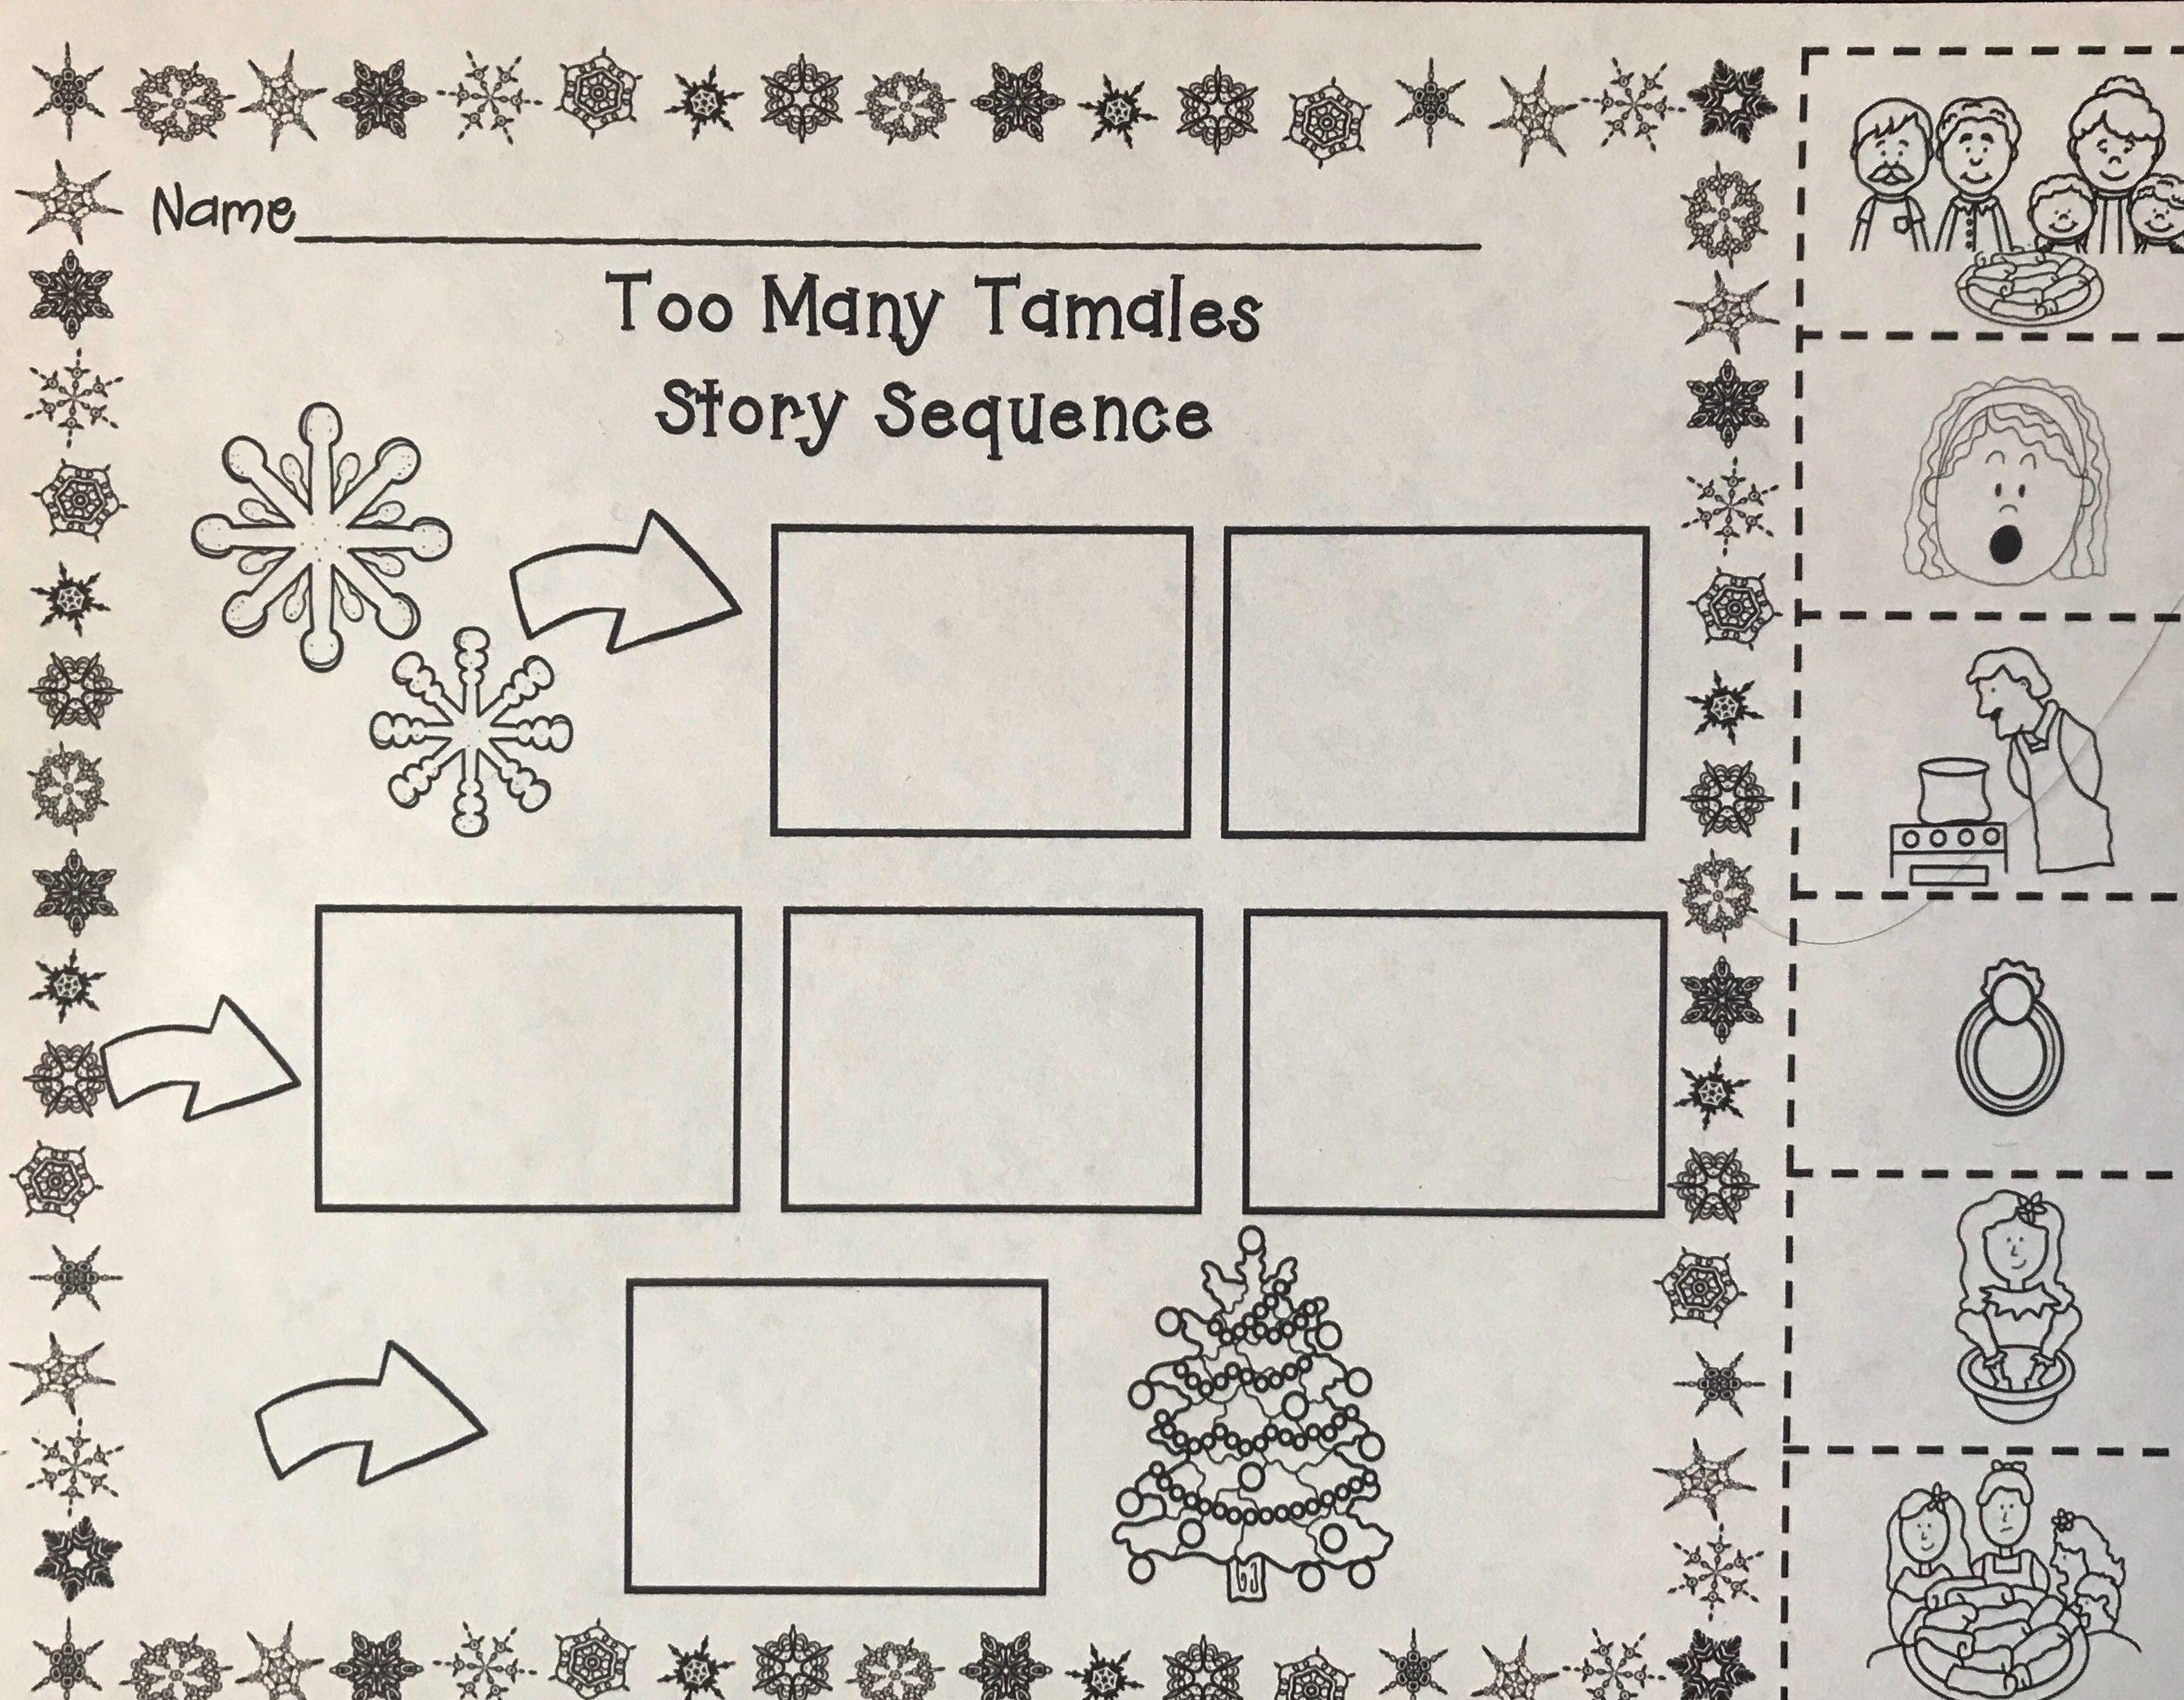 Too Many Tamales Story Sequence Kindergarten Worksheets Math Journals Kindergarten Reading Comprehension Lessons